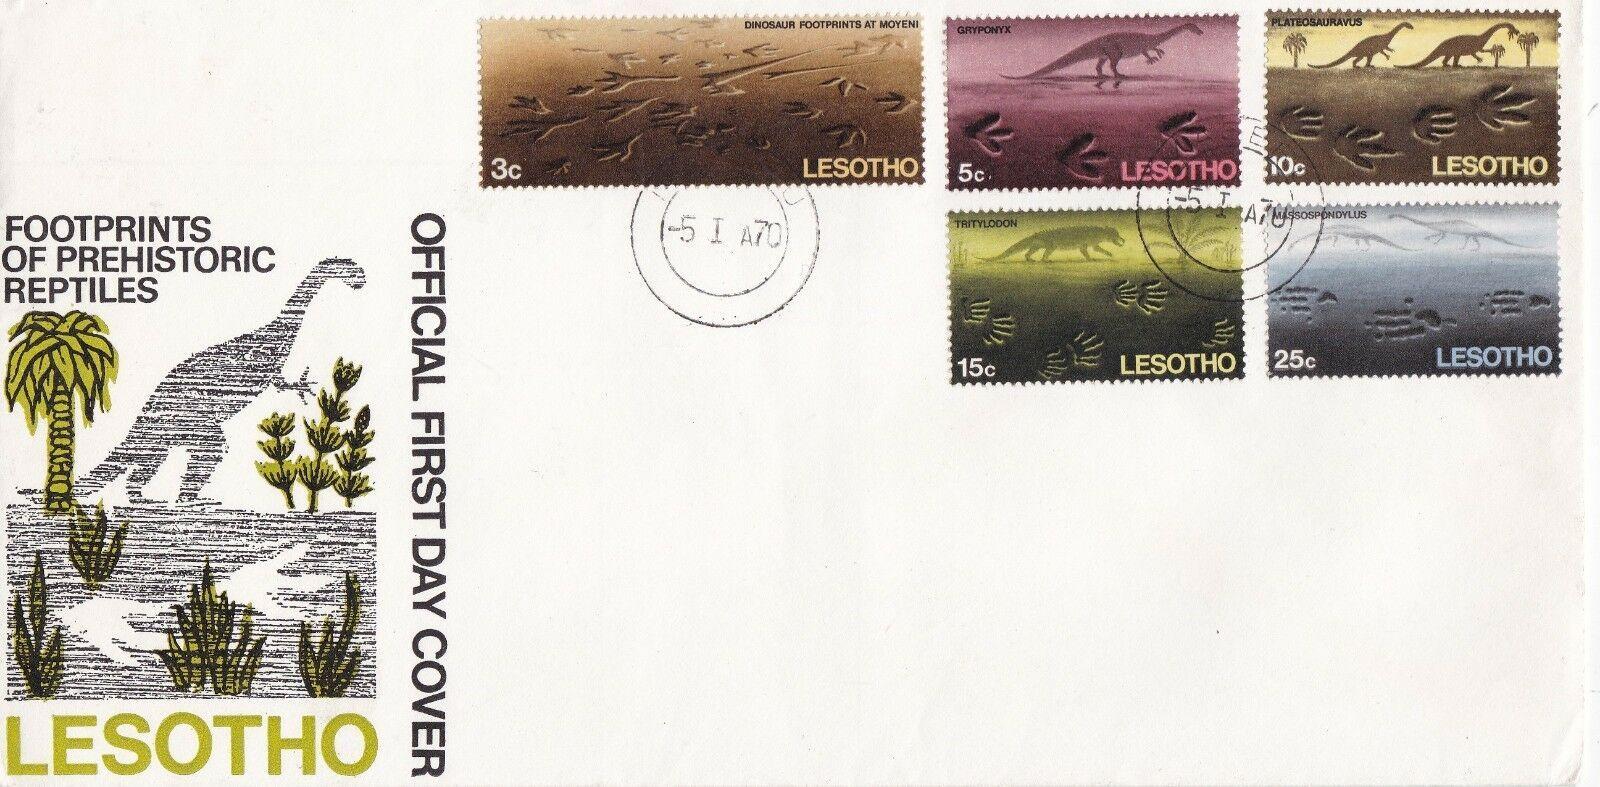 Lesotho 1970 Dinosaurs Footprints FDCa.jpg